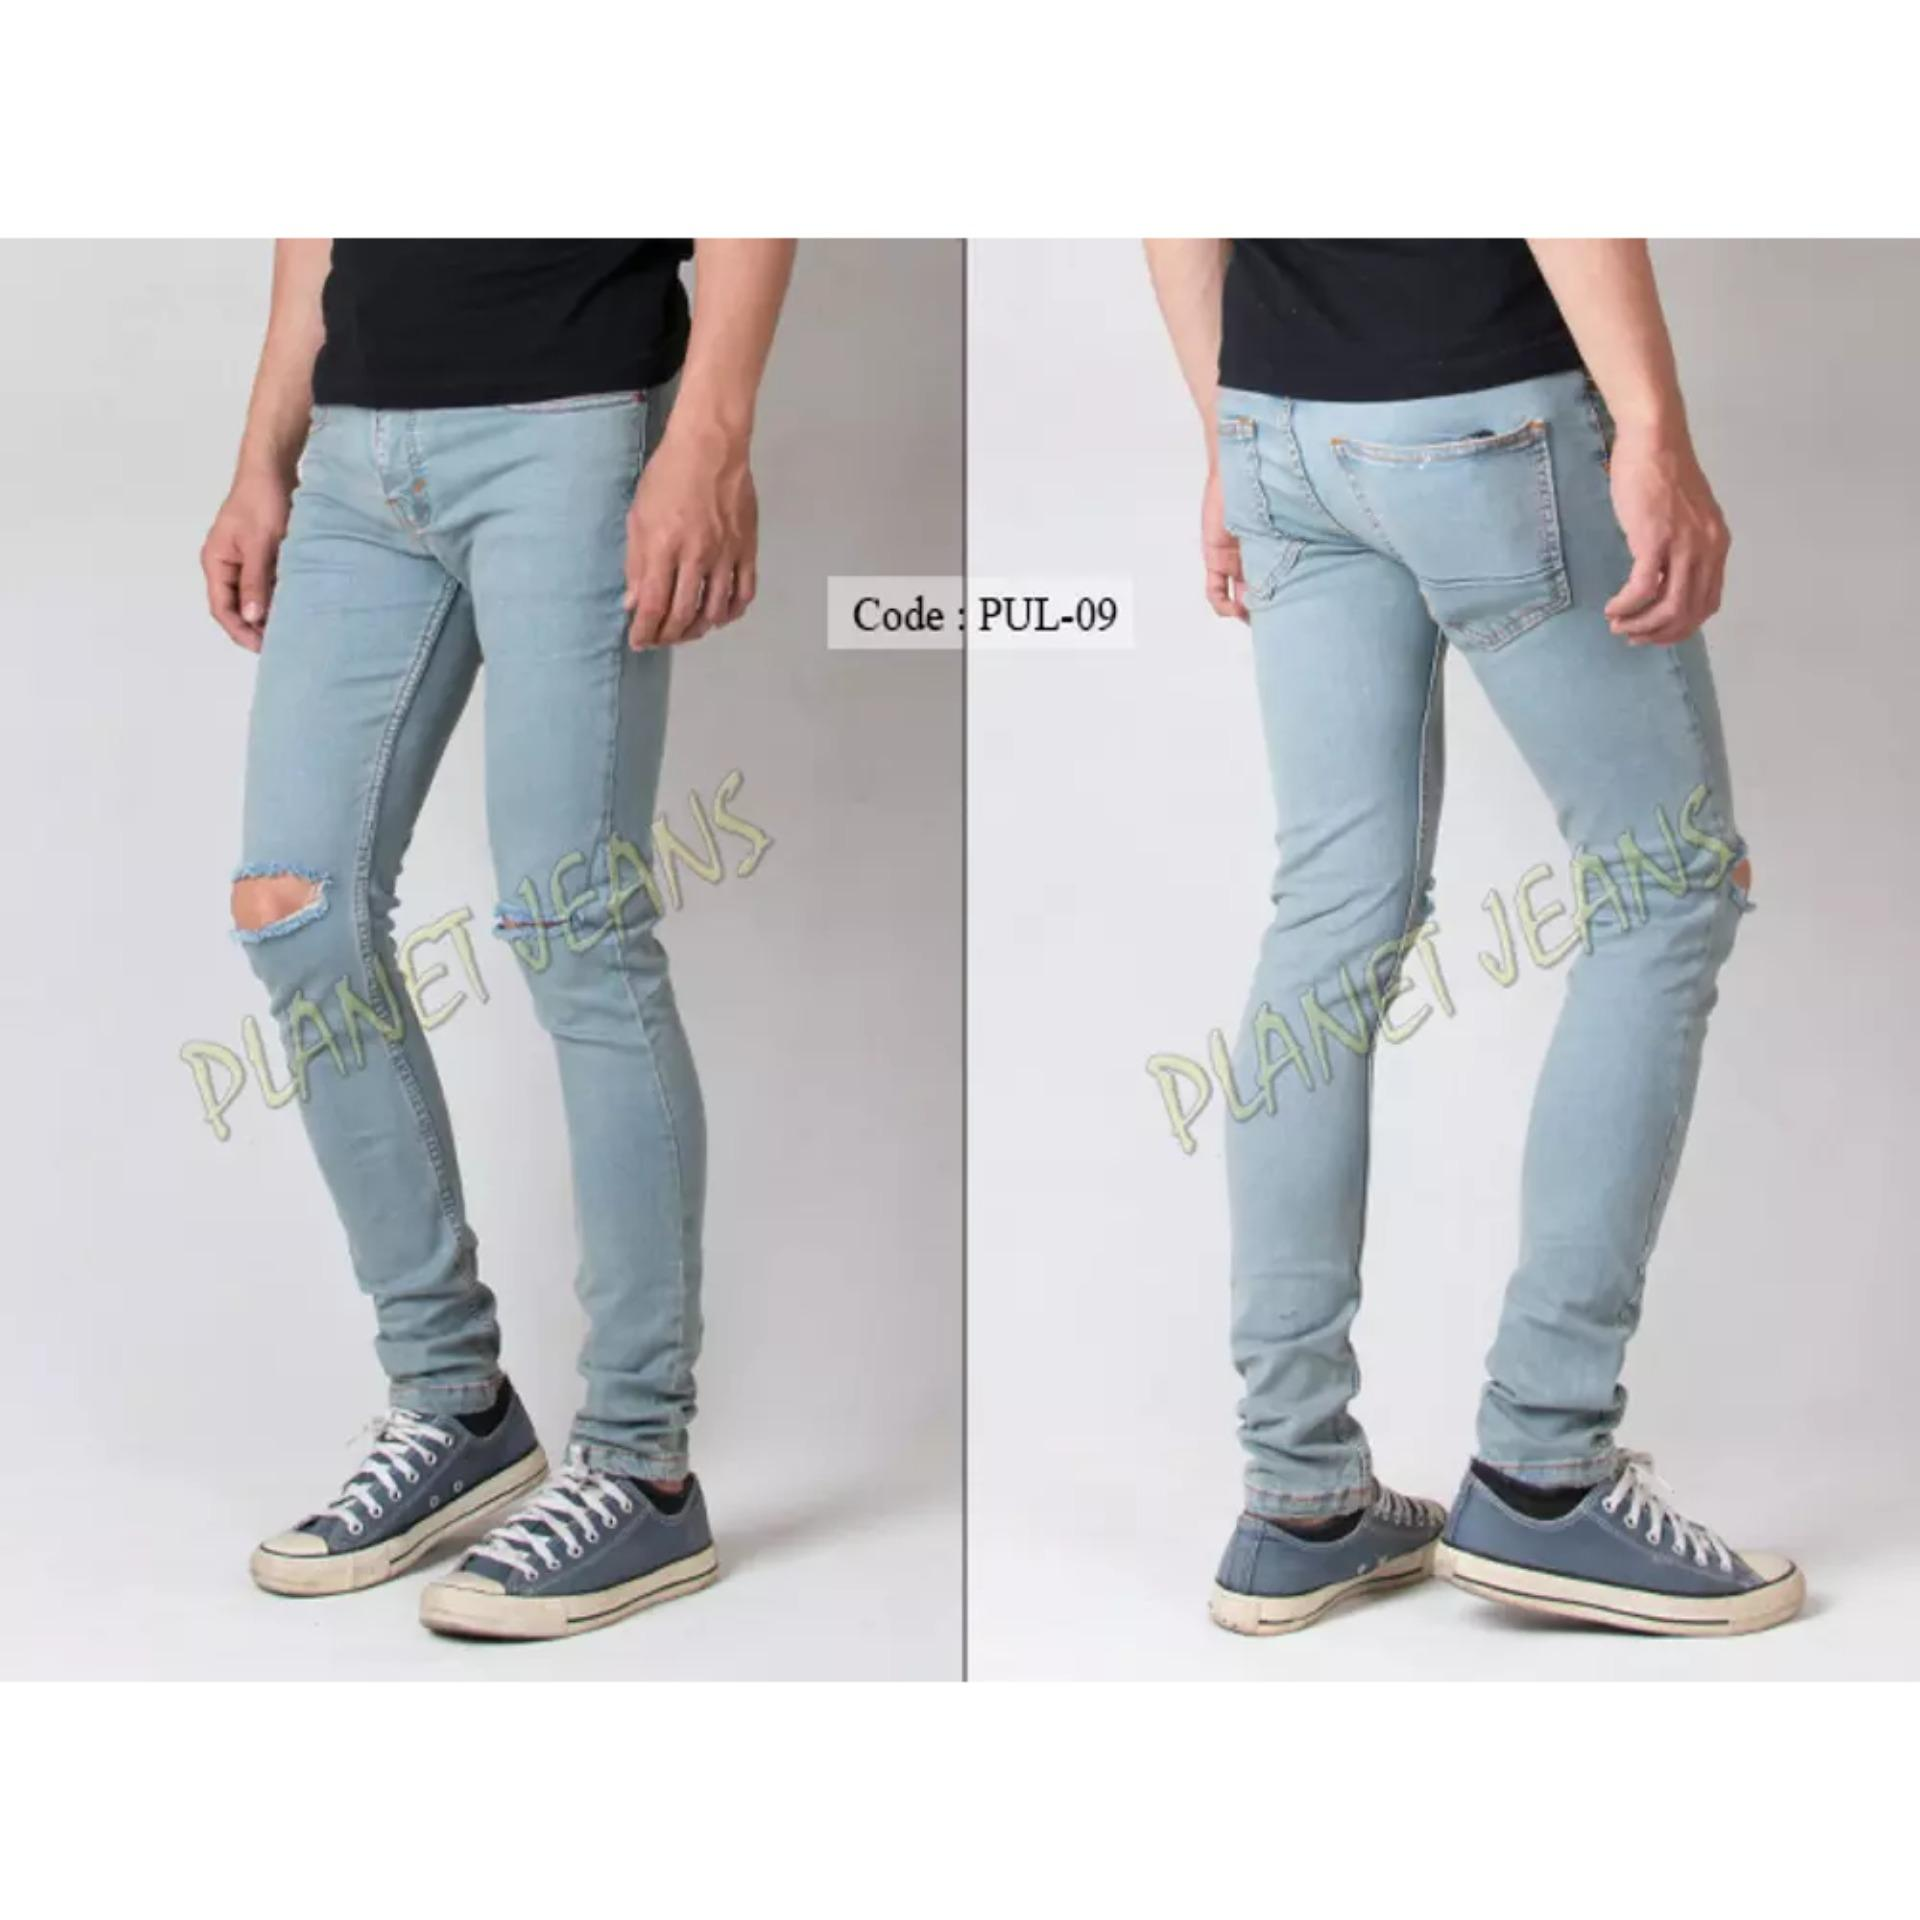 Celana Jeans Panjang Premium Robek Lutut Pria Skinny / Pensil / Denim Skiny Sobek Di Dengkul Warna Vintage Blue / Hitam / Biru Dongker Cowok 1